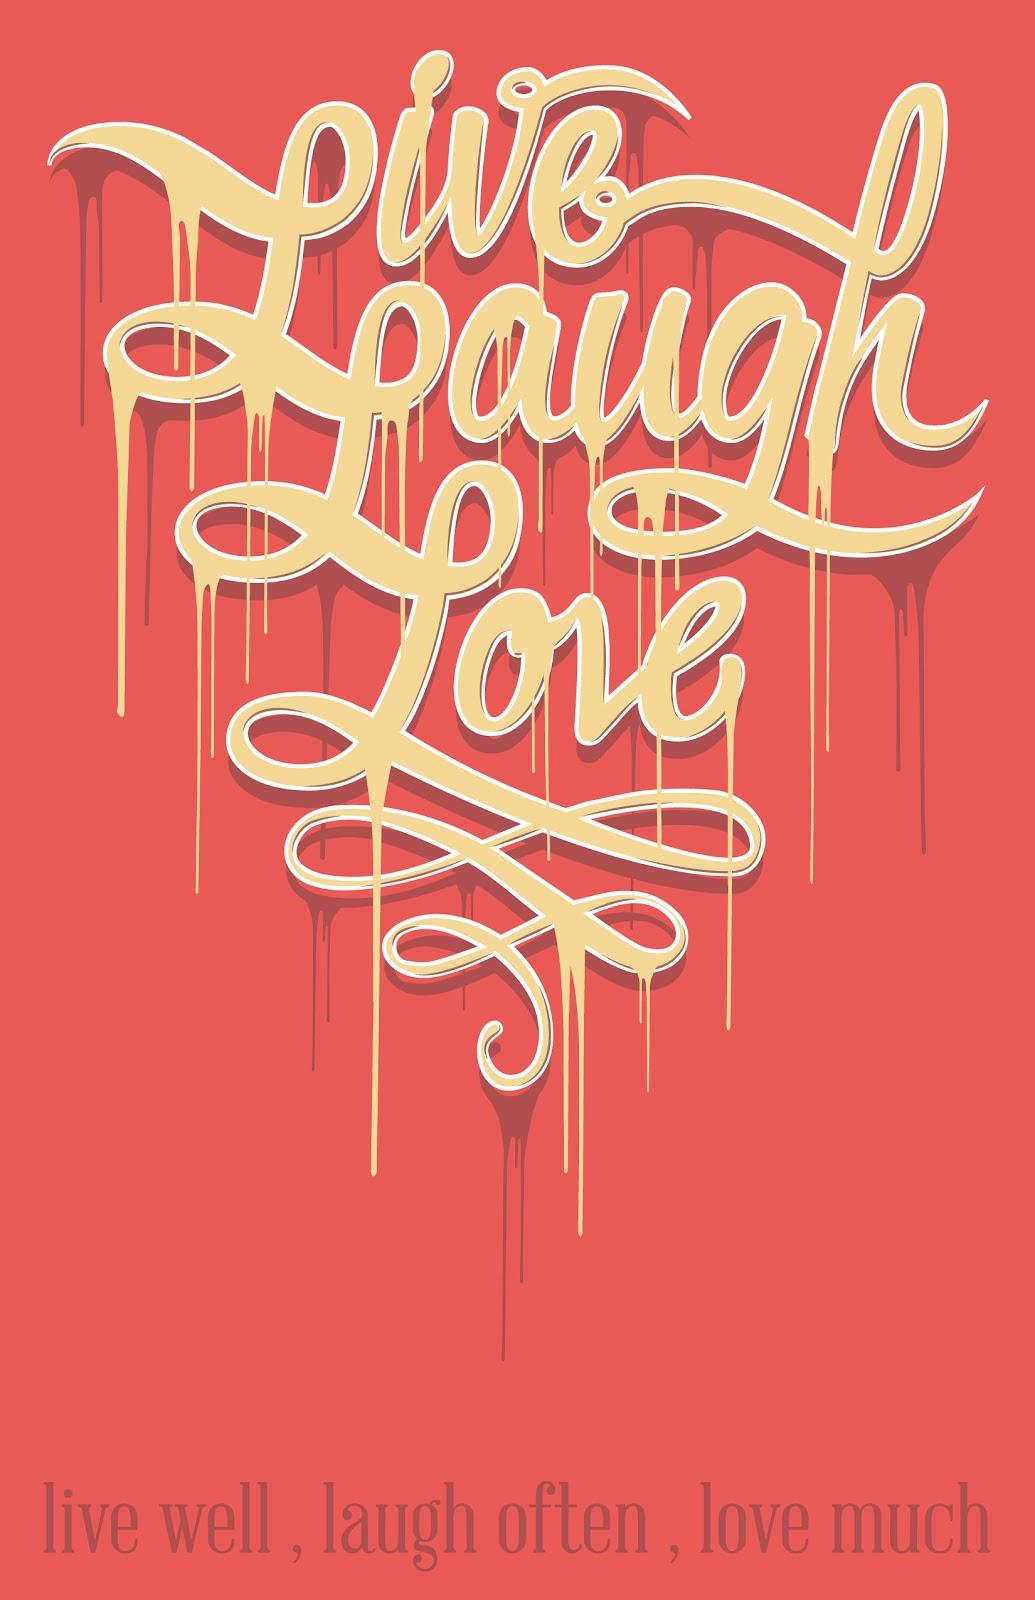 nam trandang portfolio live laugh love typography. Black Bedroom Furniture Sets. Home Design Ideas